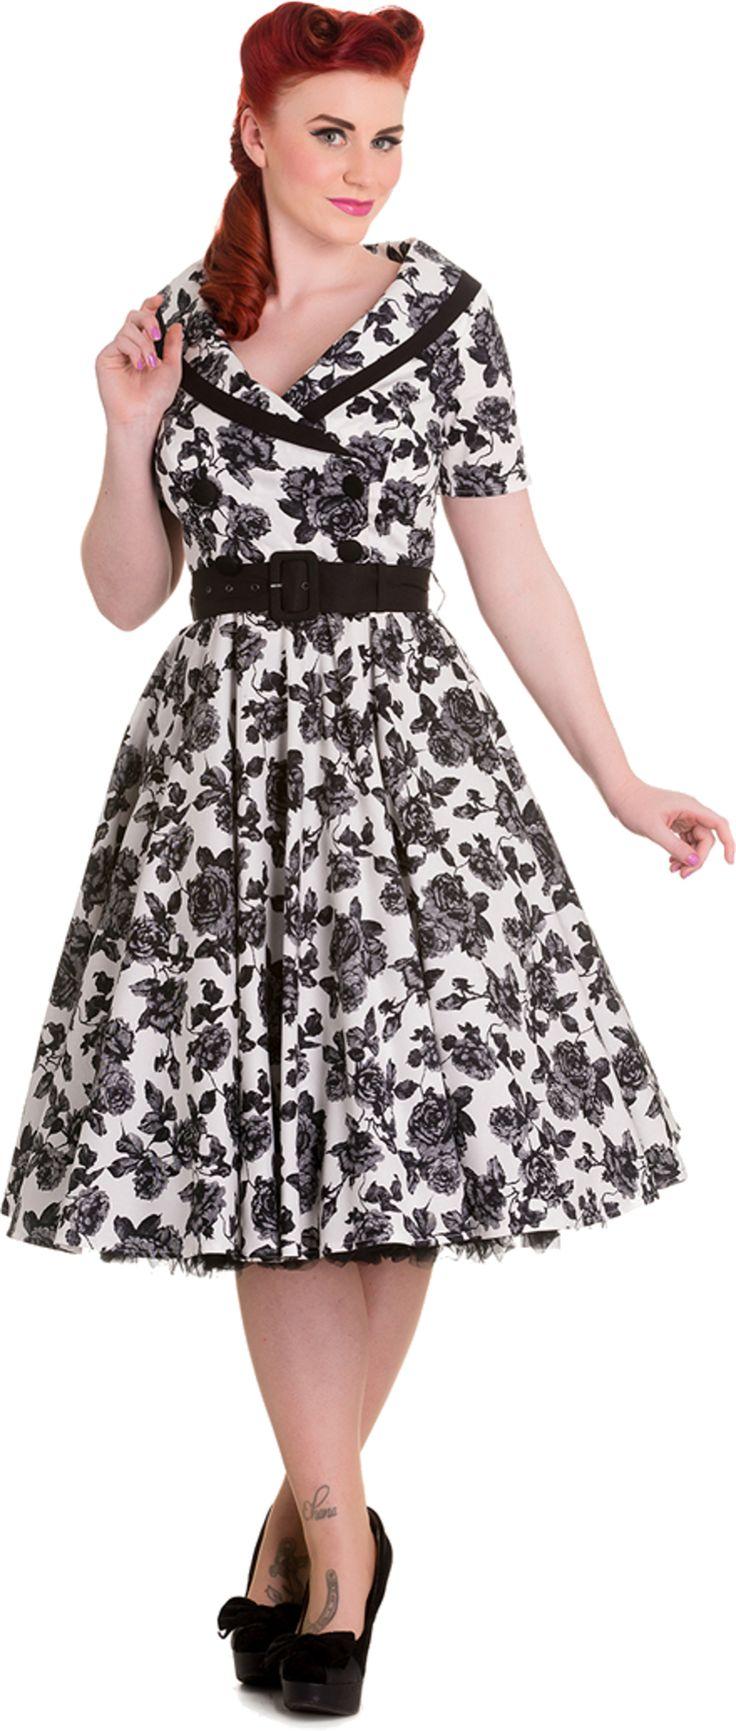 Hell Bunny HONOR Vintage ROSEN V-Neck Kurzarm SWING DRESS Kleid